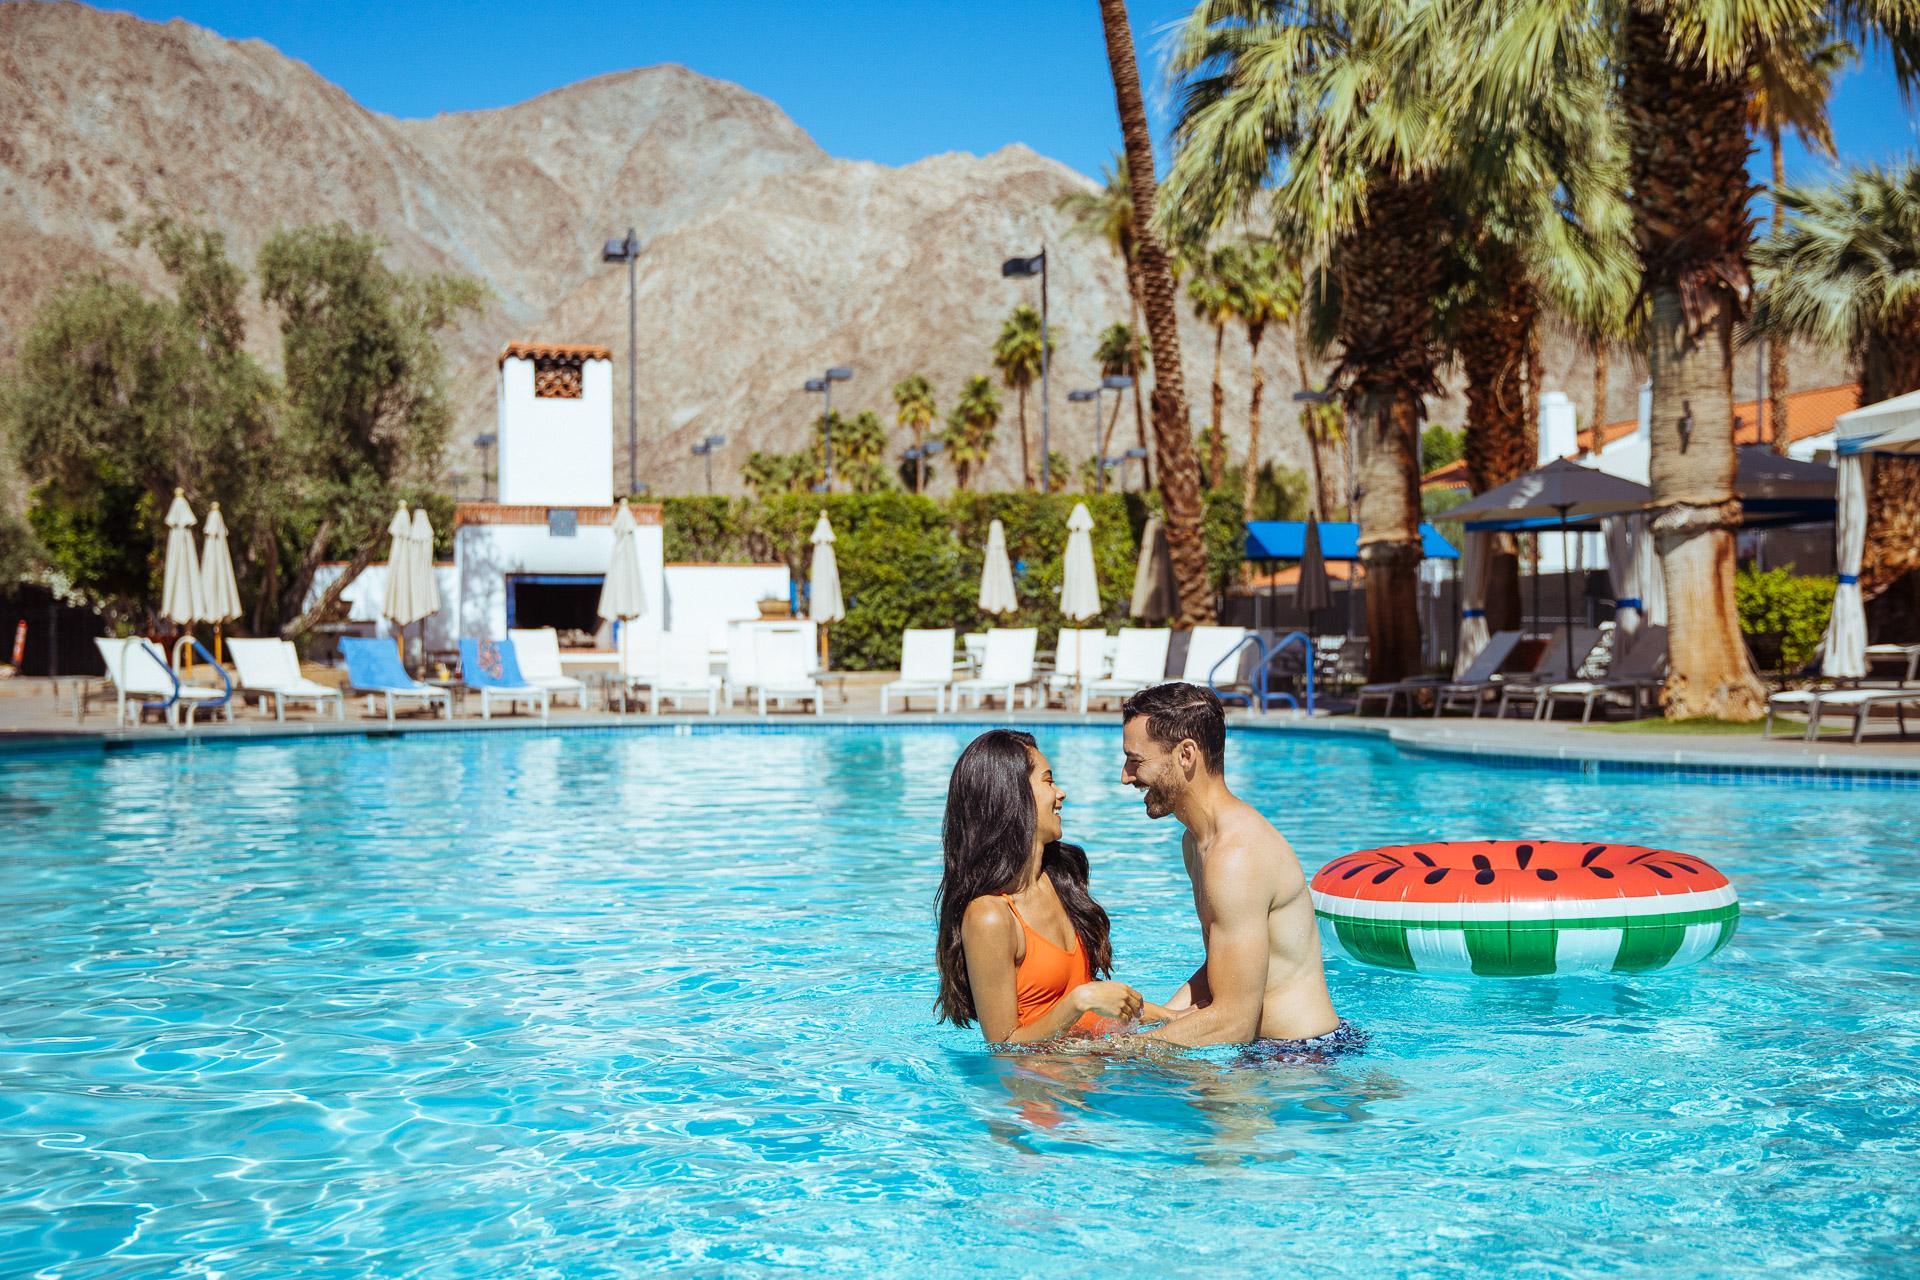 palm-springs-california-hotel-lifestyle-photographer-la-quinta-resort-club-15.jpg